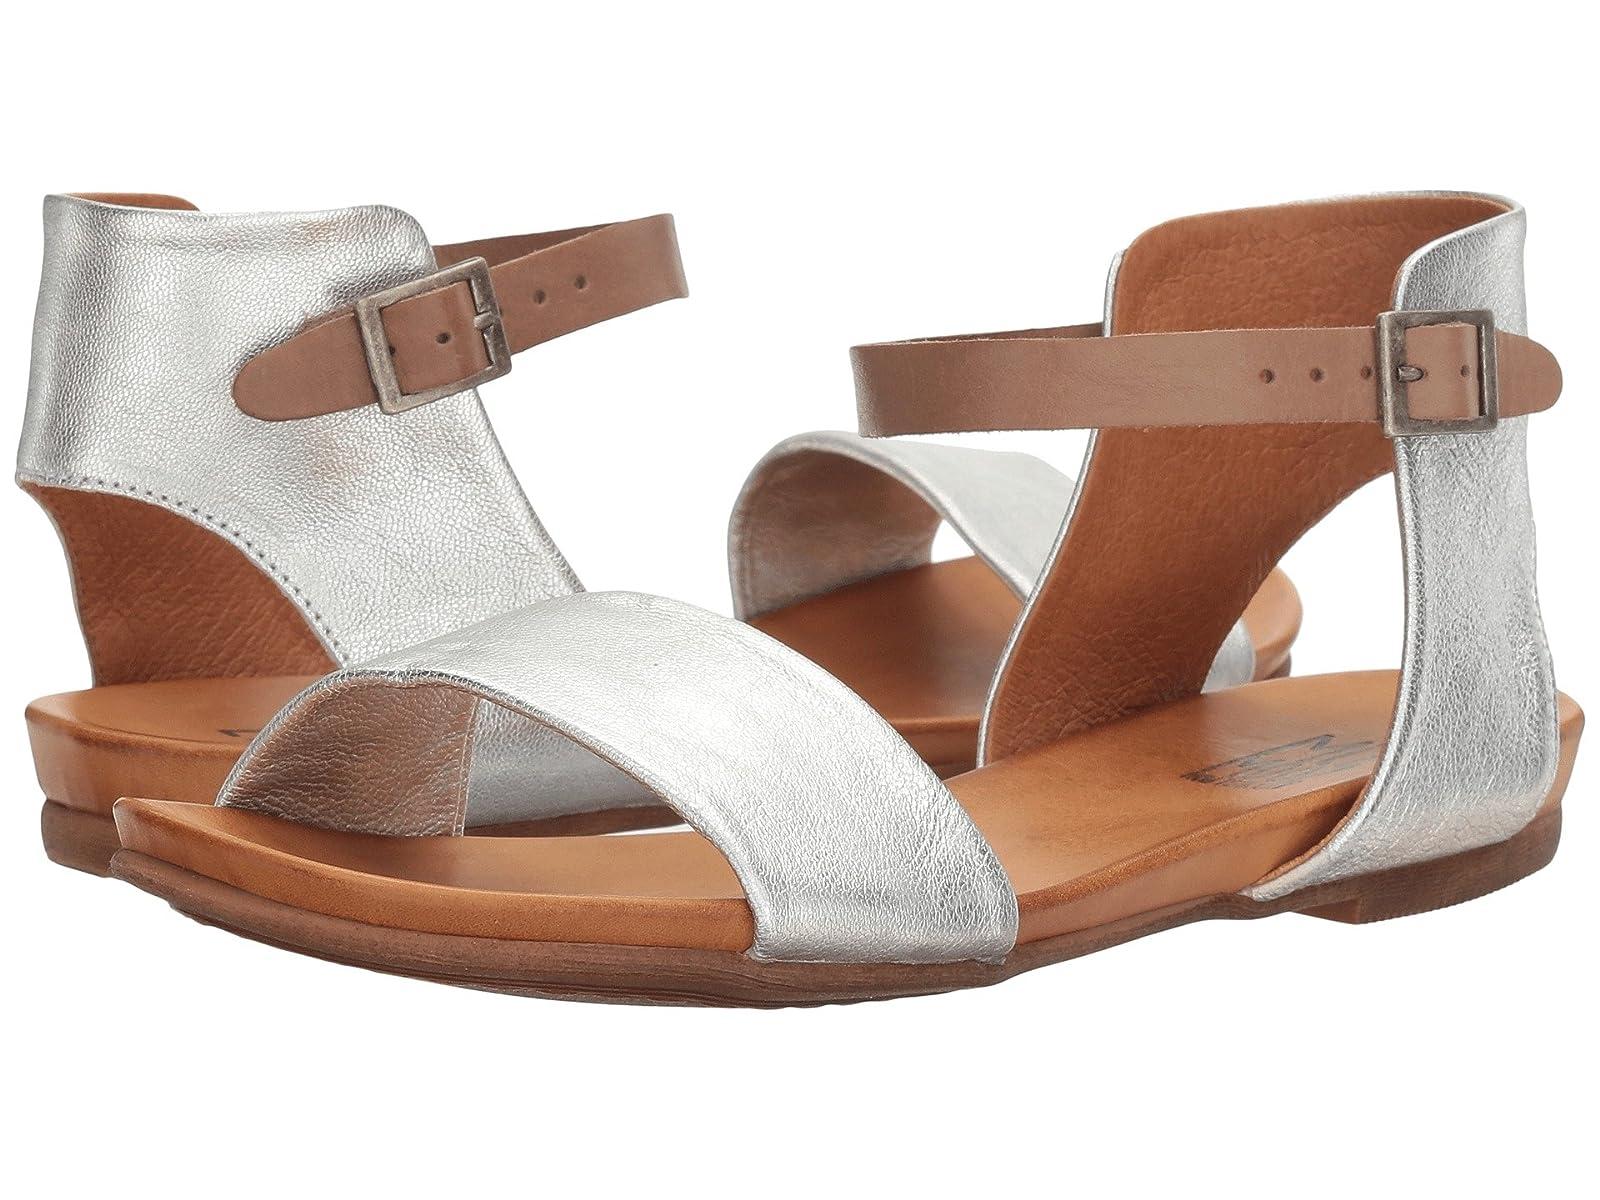 Miz Mooz AlanisAtmospheric grades have affordable shoes